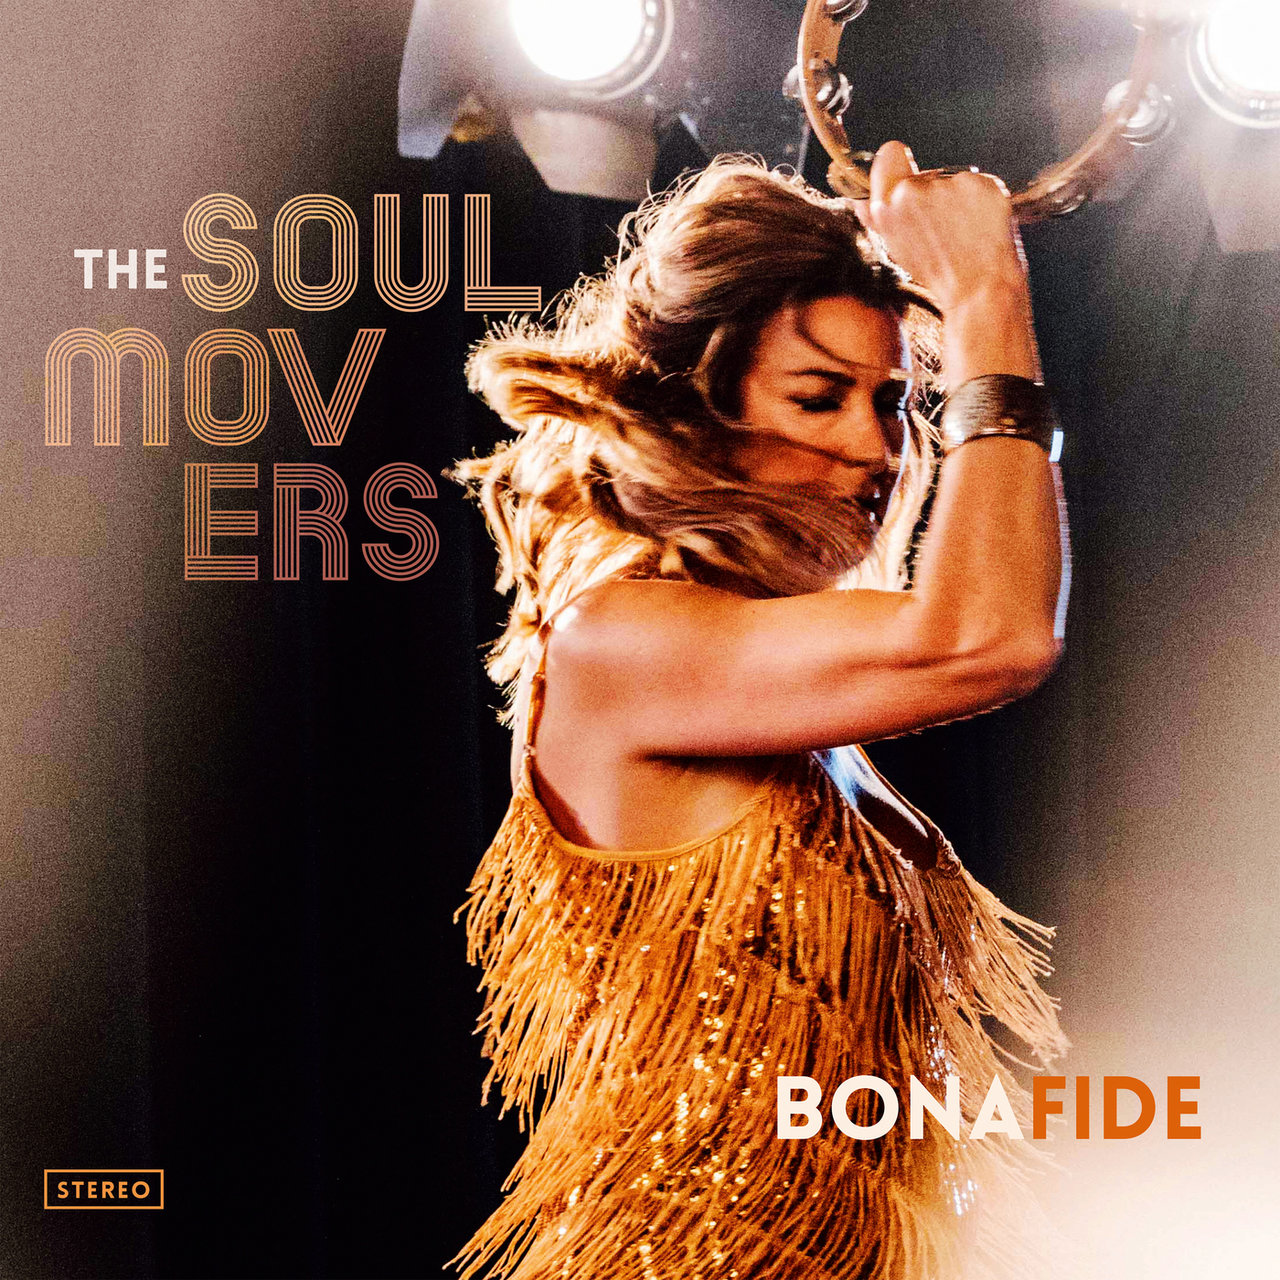 The Soul Movers - Bona Fide (2019) Flac